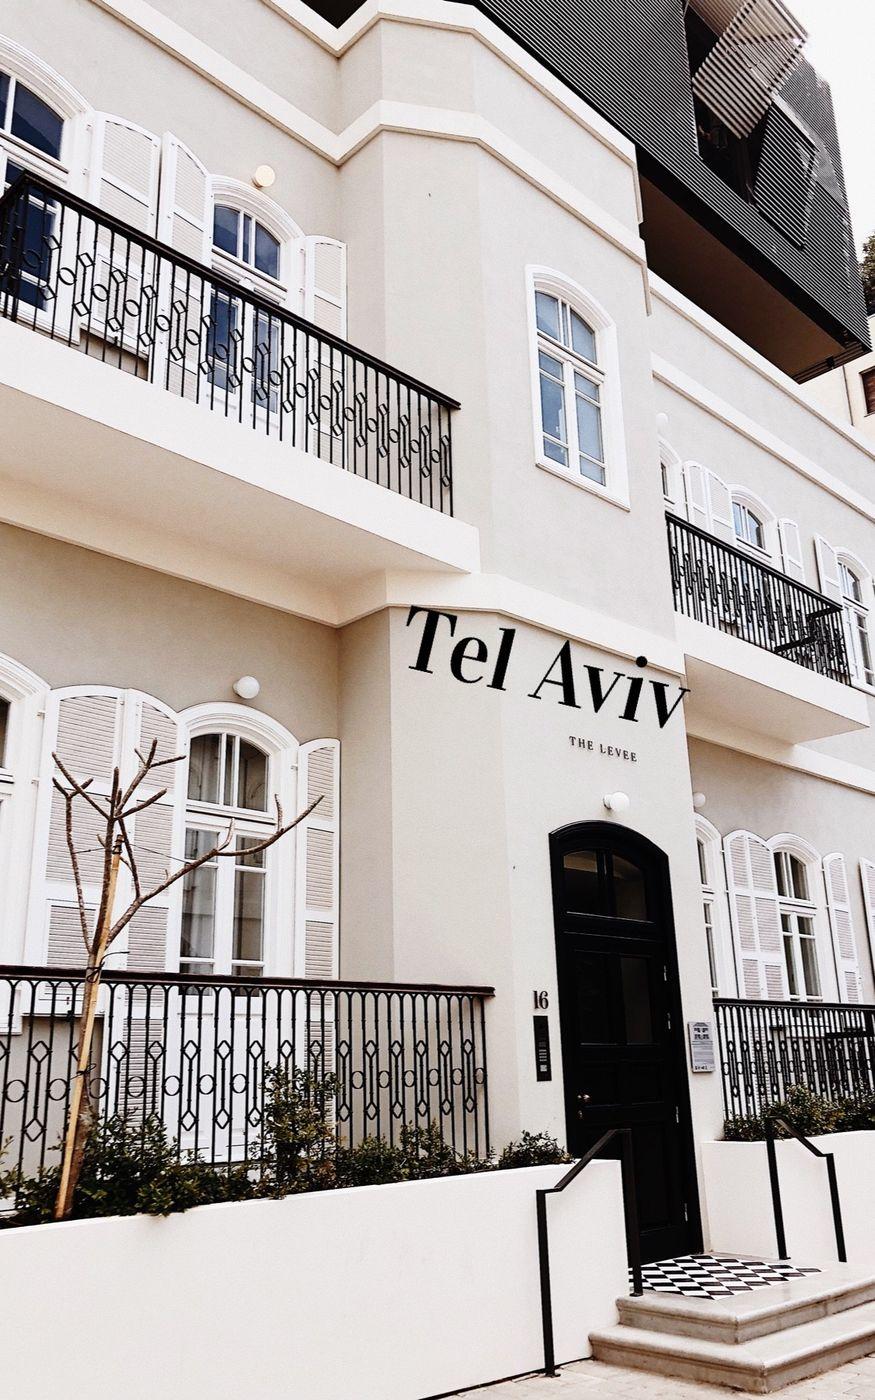 The Levee Adventure - Tel Aviv April 2019